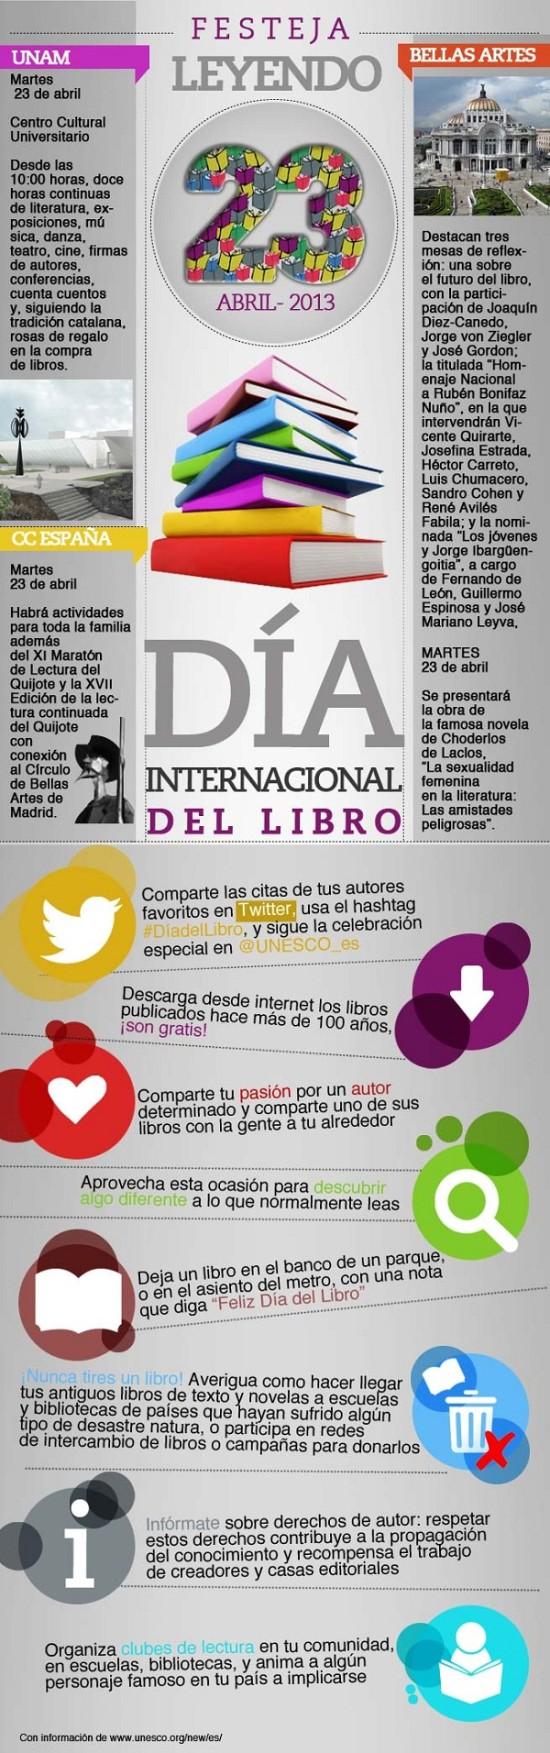 Infografias Diá del Libro  (4)